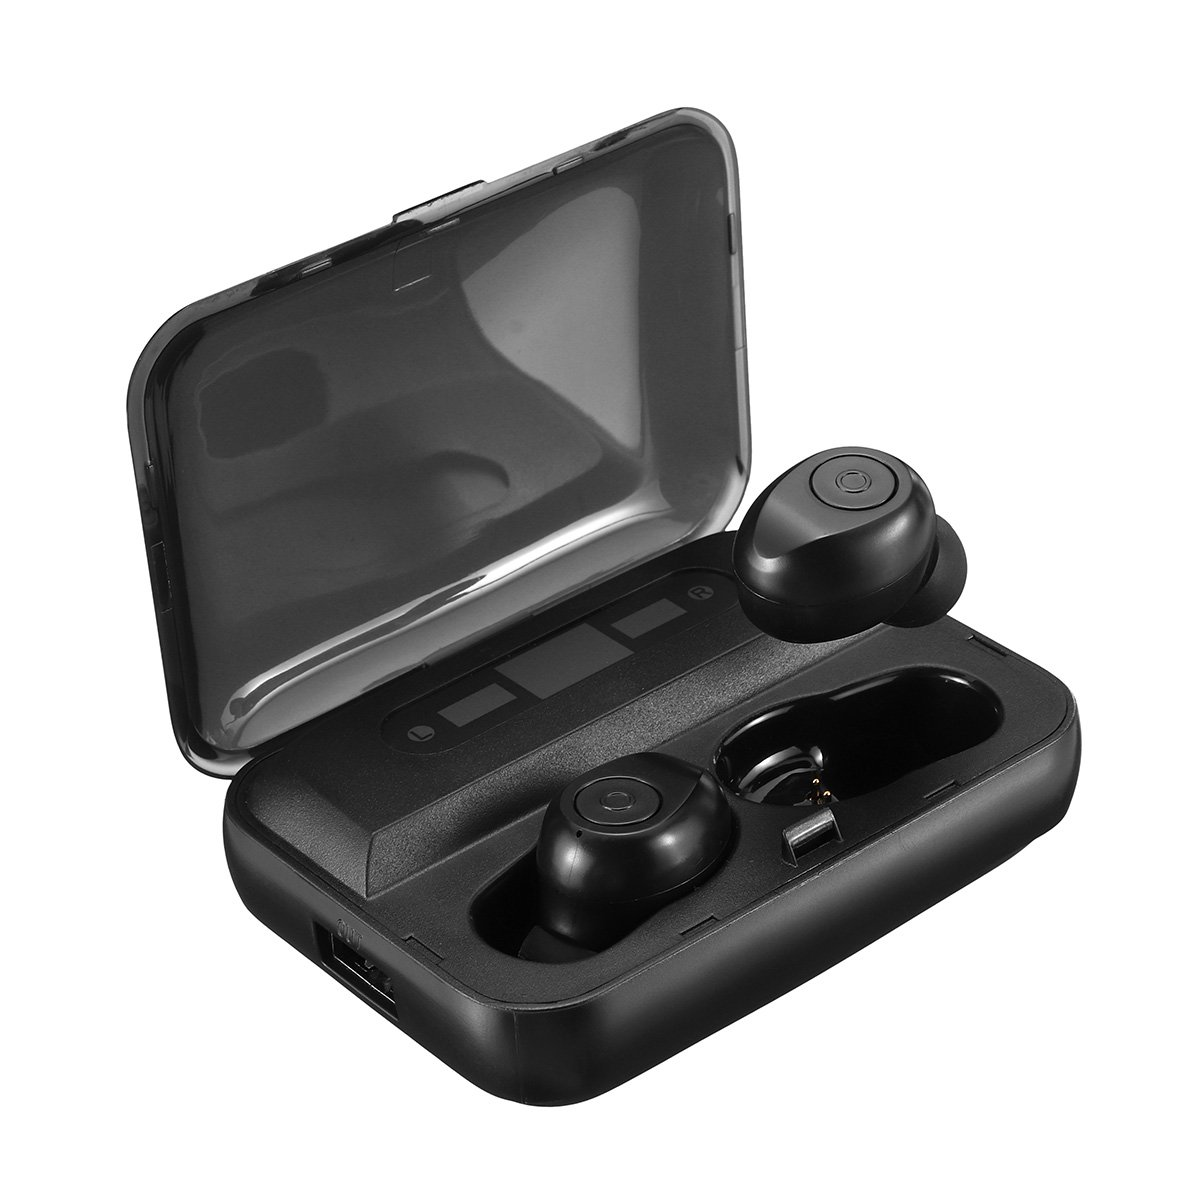 TWS Wireless bluetooth 5.0 Earphone Dual LED Power Display 1300mAh Type-C Charge IPX7 Waterproof Hea